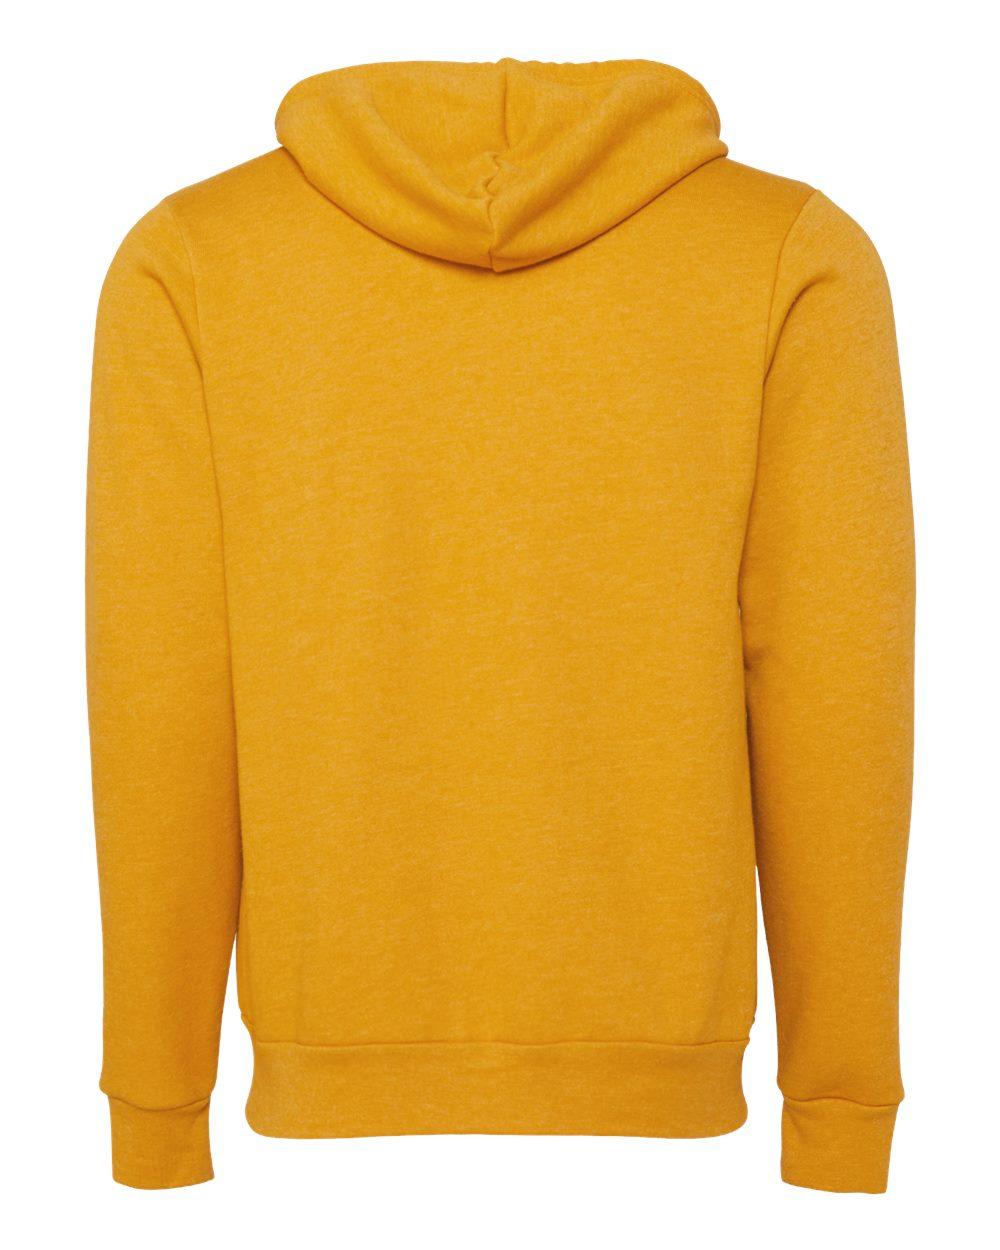 Bella-Canvas-Unisex-Full-Zip-Up-Hooded-Sweatshirt-Blank-Hoodie-3739-up-to-3XL thumbnail 44